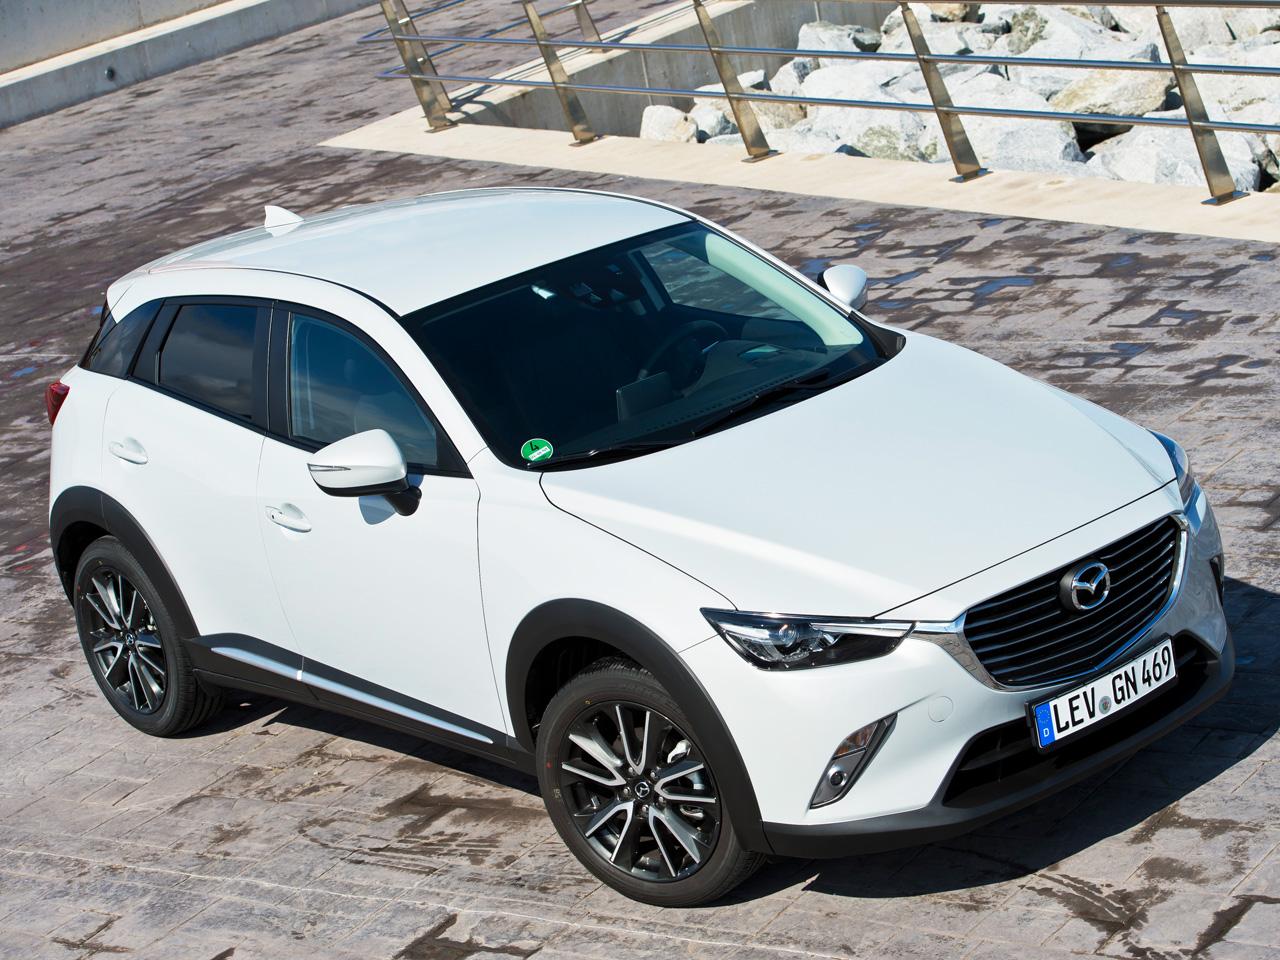 Mazda Cx 3 Skyactiv G 160 Awdcx 5 Vergleichstest Autozeitungde